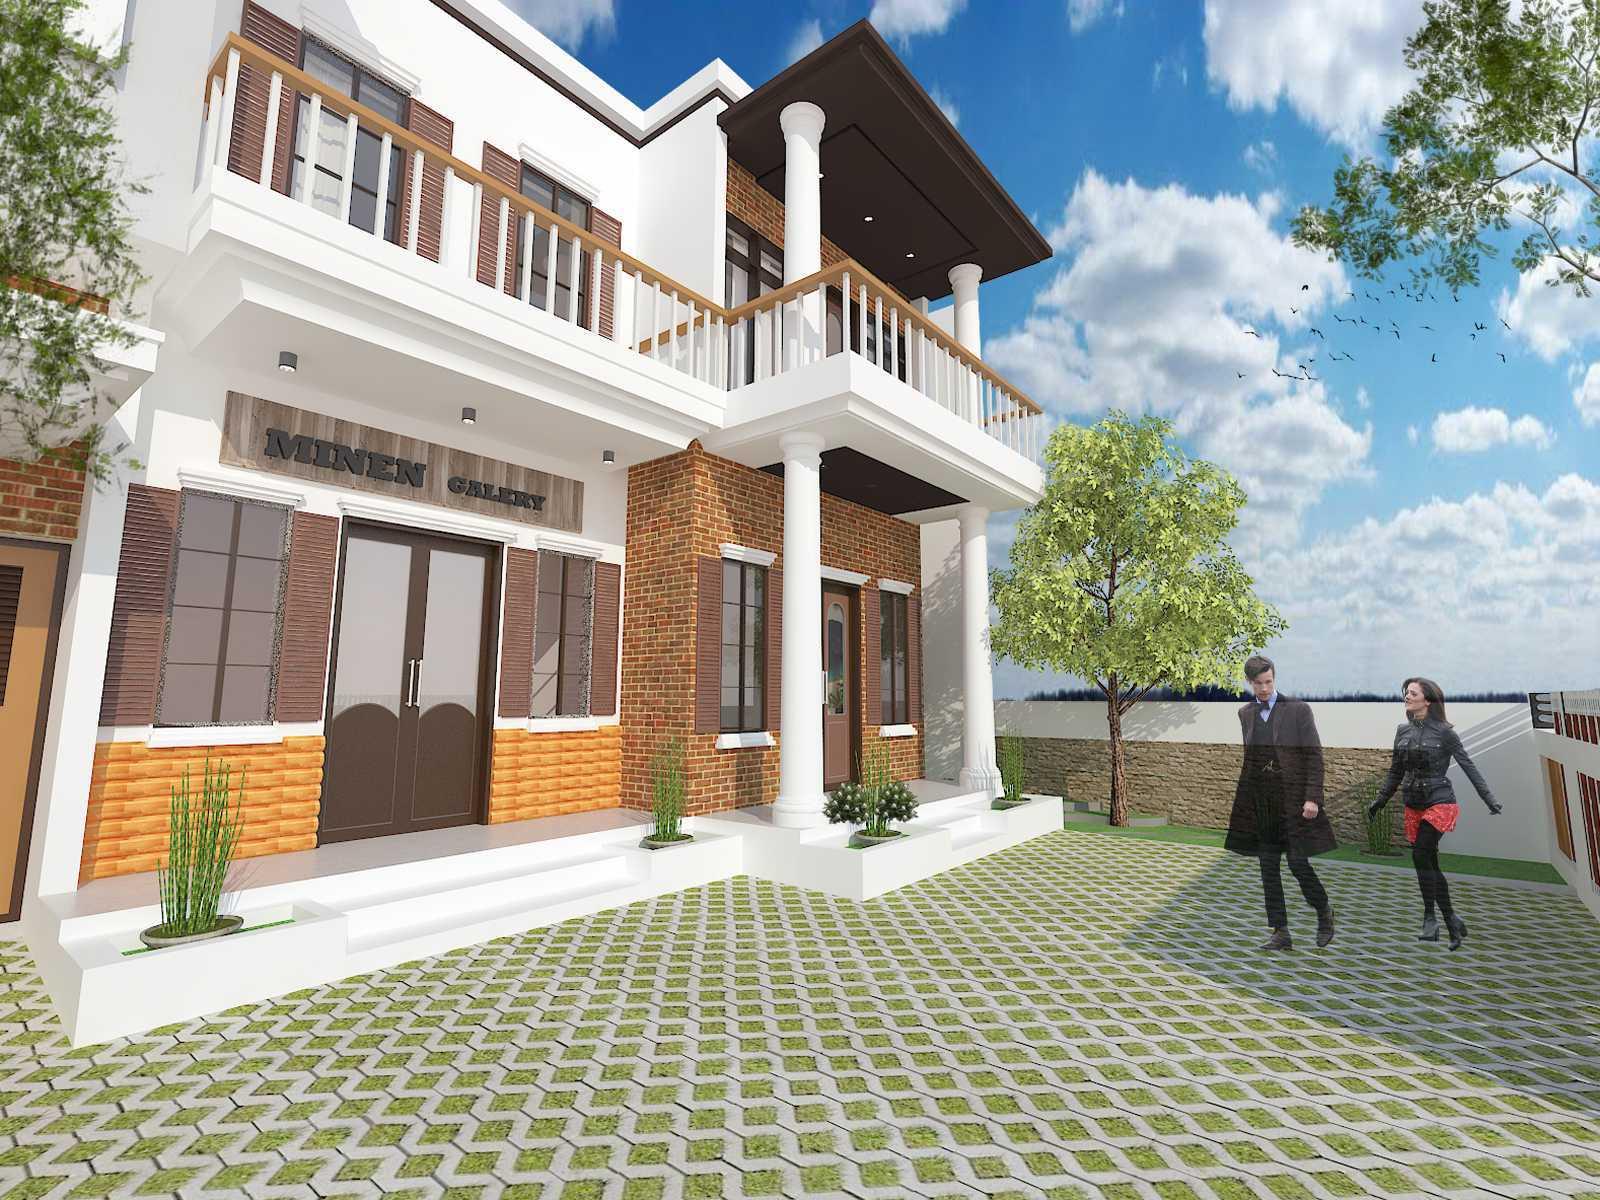 Archdesignbuild7 Rumah Tinggal 2 Lantai ( Minen )  Jl. Alfa Ii, Cigadung, Bandung Jl. Alfa Ii, Cigadung, Bandung Fasade-Baru-2 Minimalis  20787